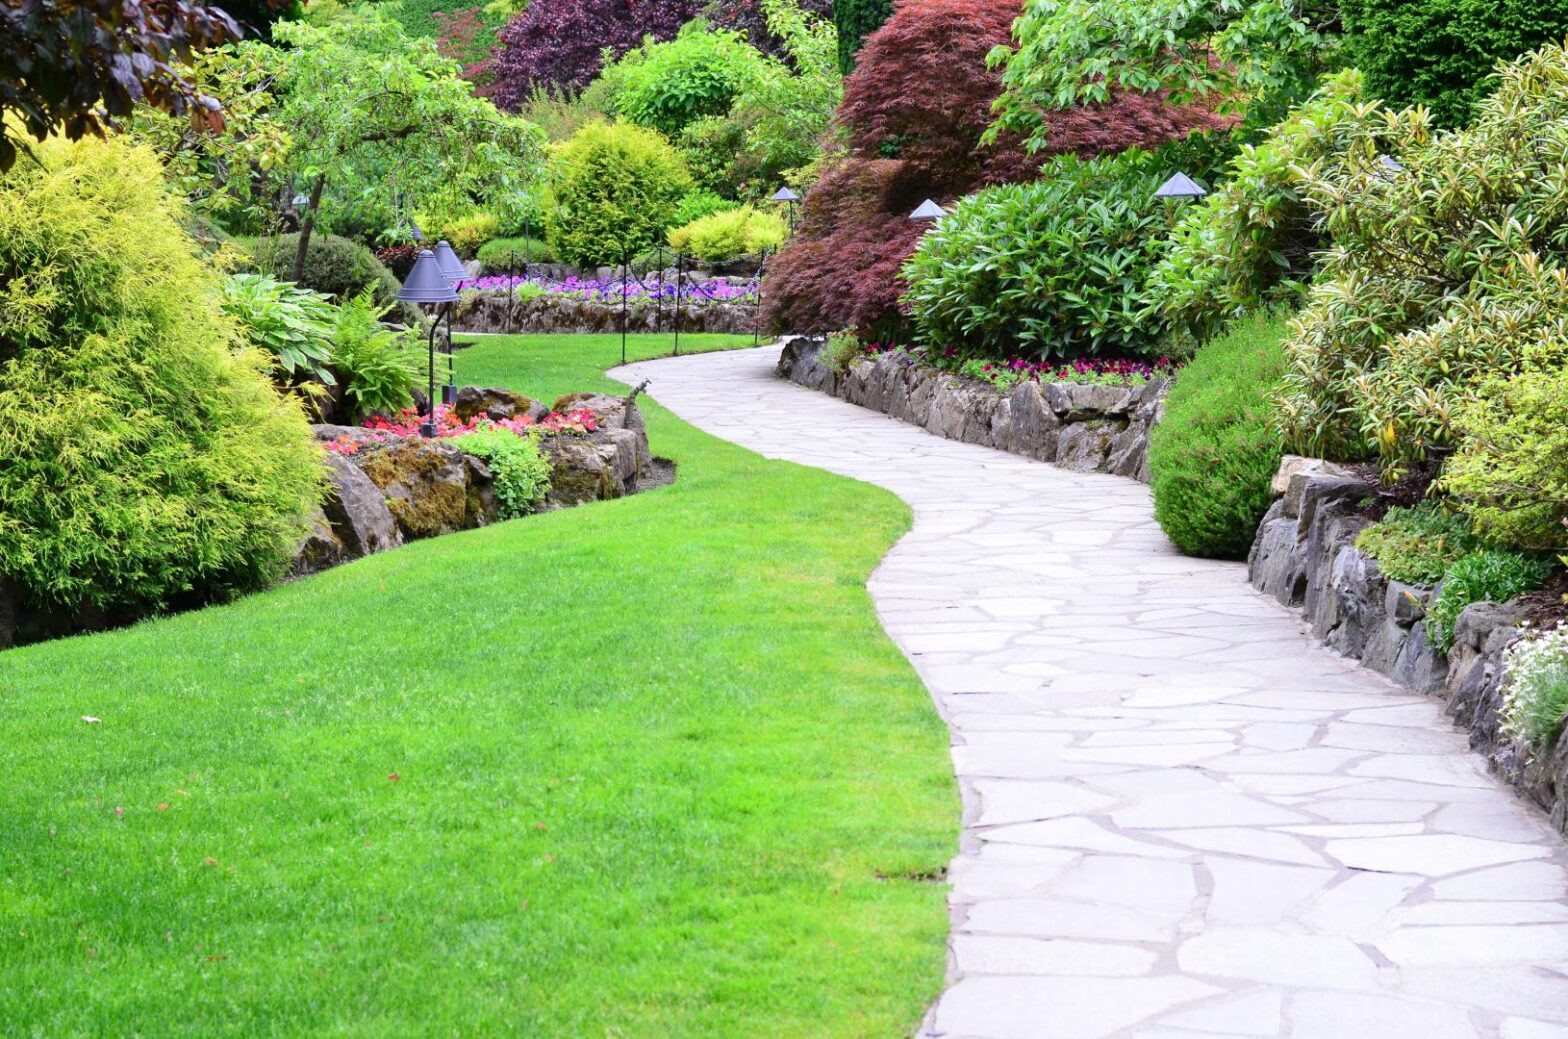 chemin dans le jardin